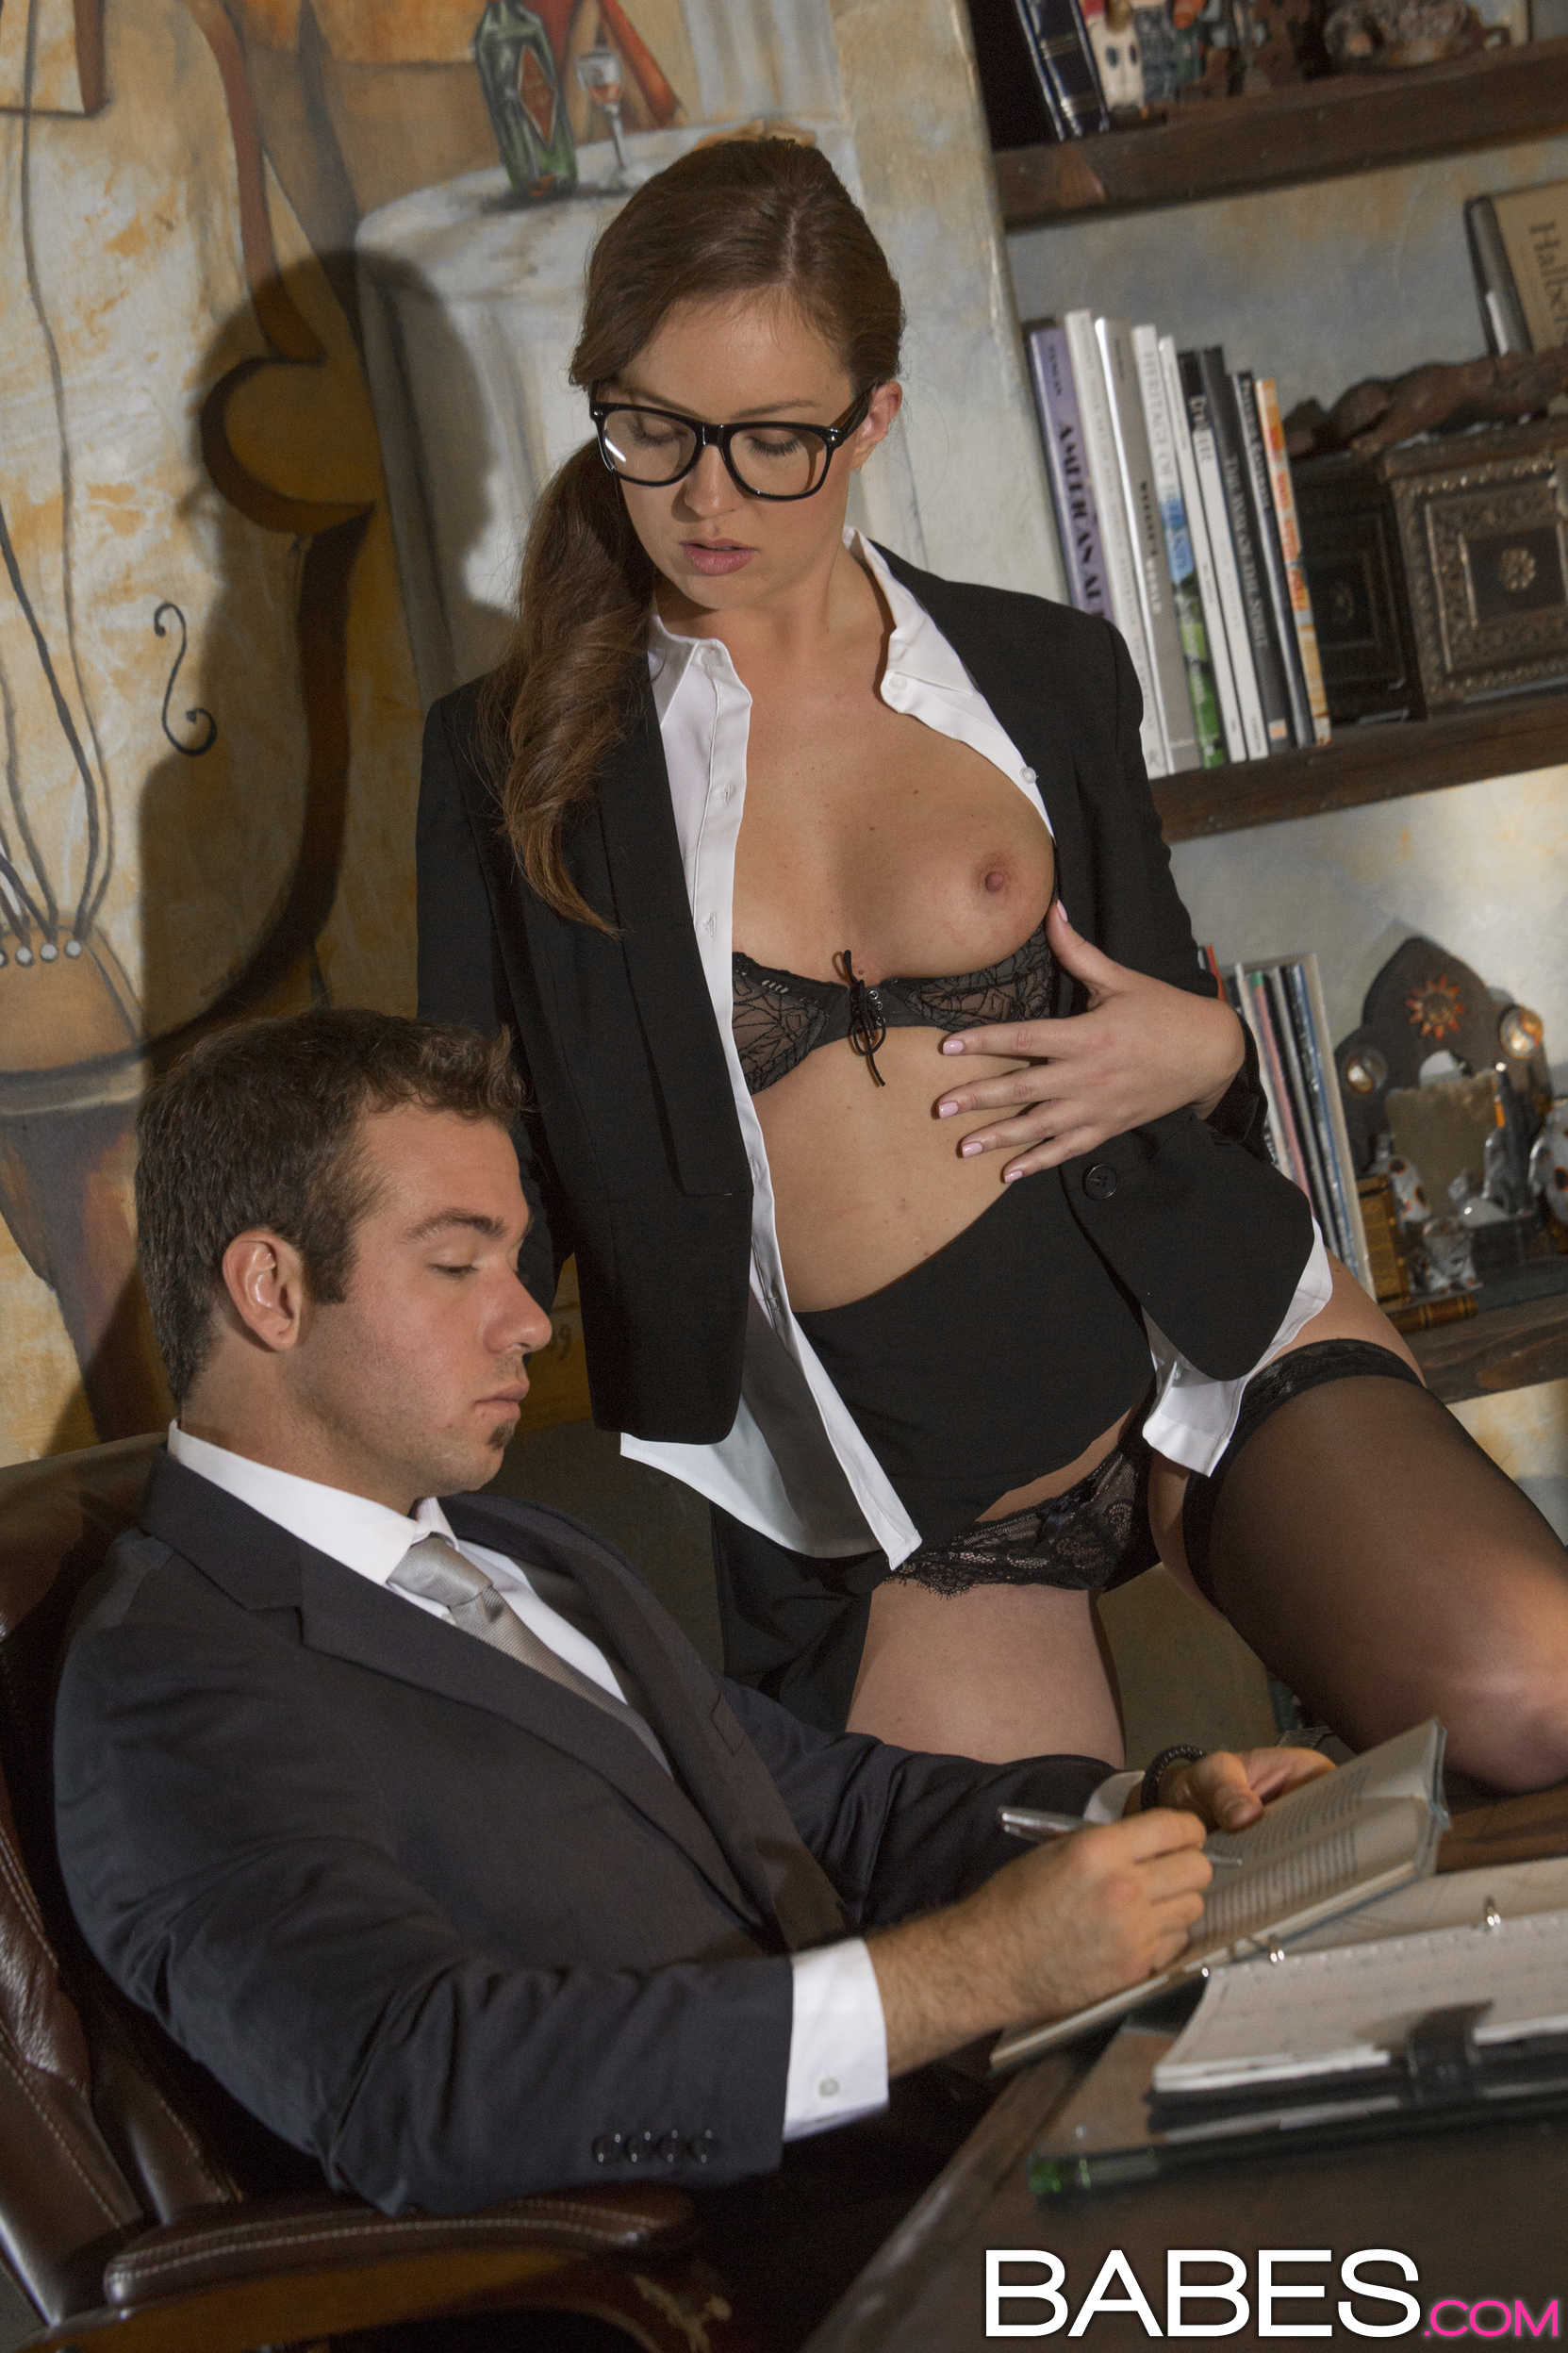 супер мулатка секретарша соблазняет шефа девочка